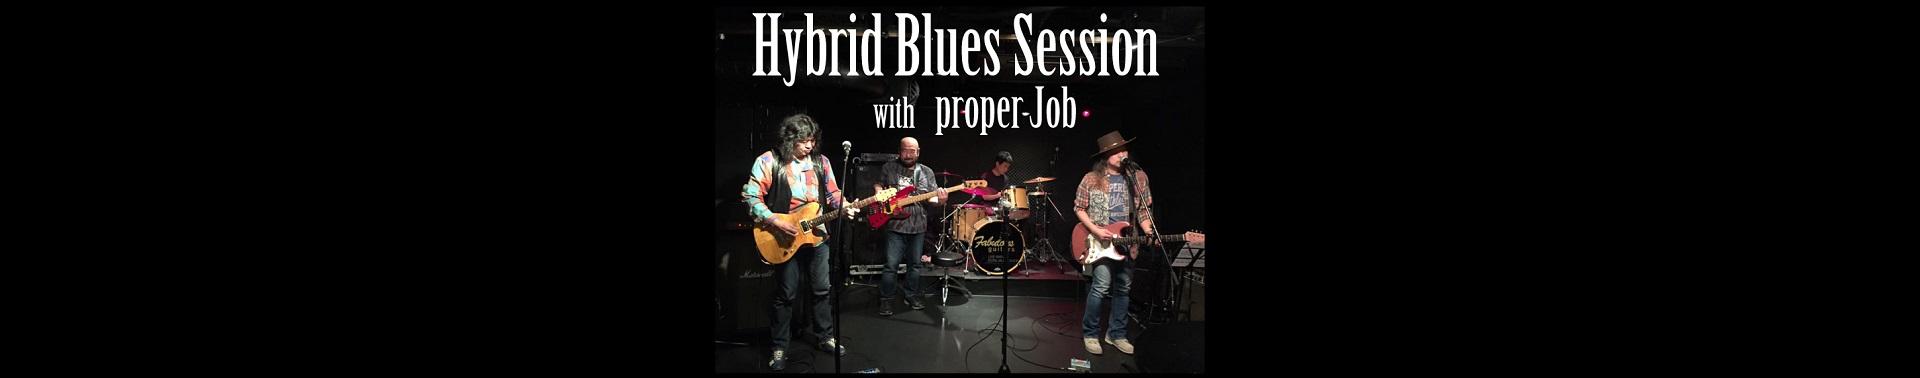 hybridshiroe